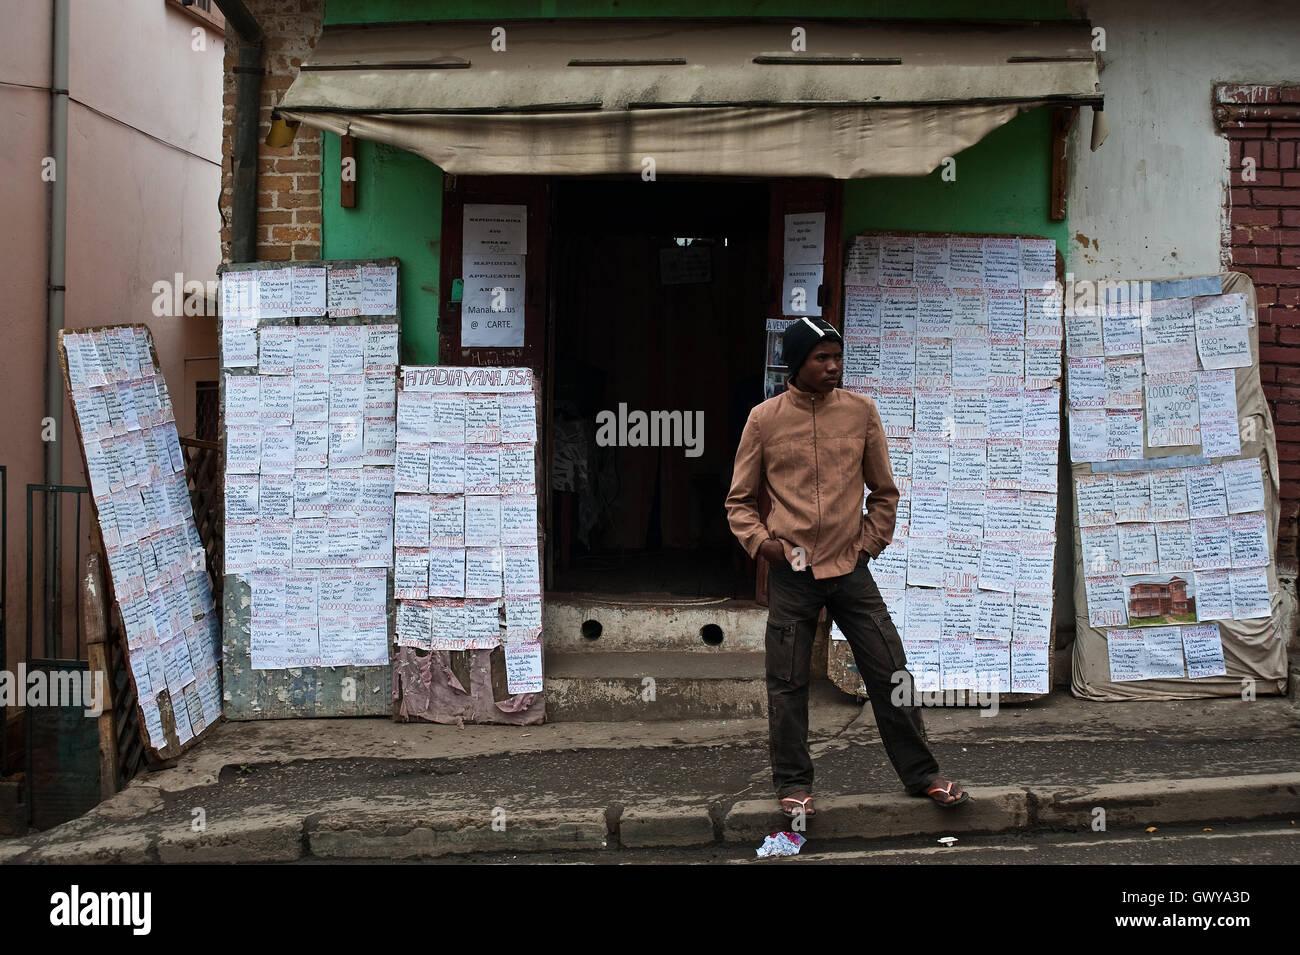 Immobilienagentur (Madagaskar) Stockbild